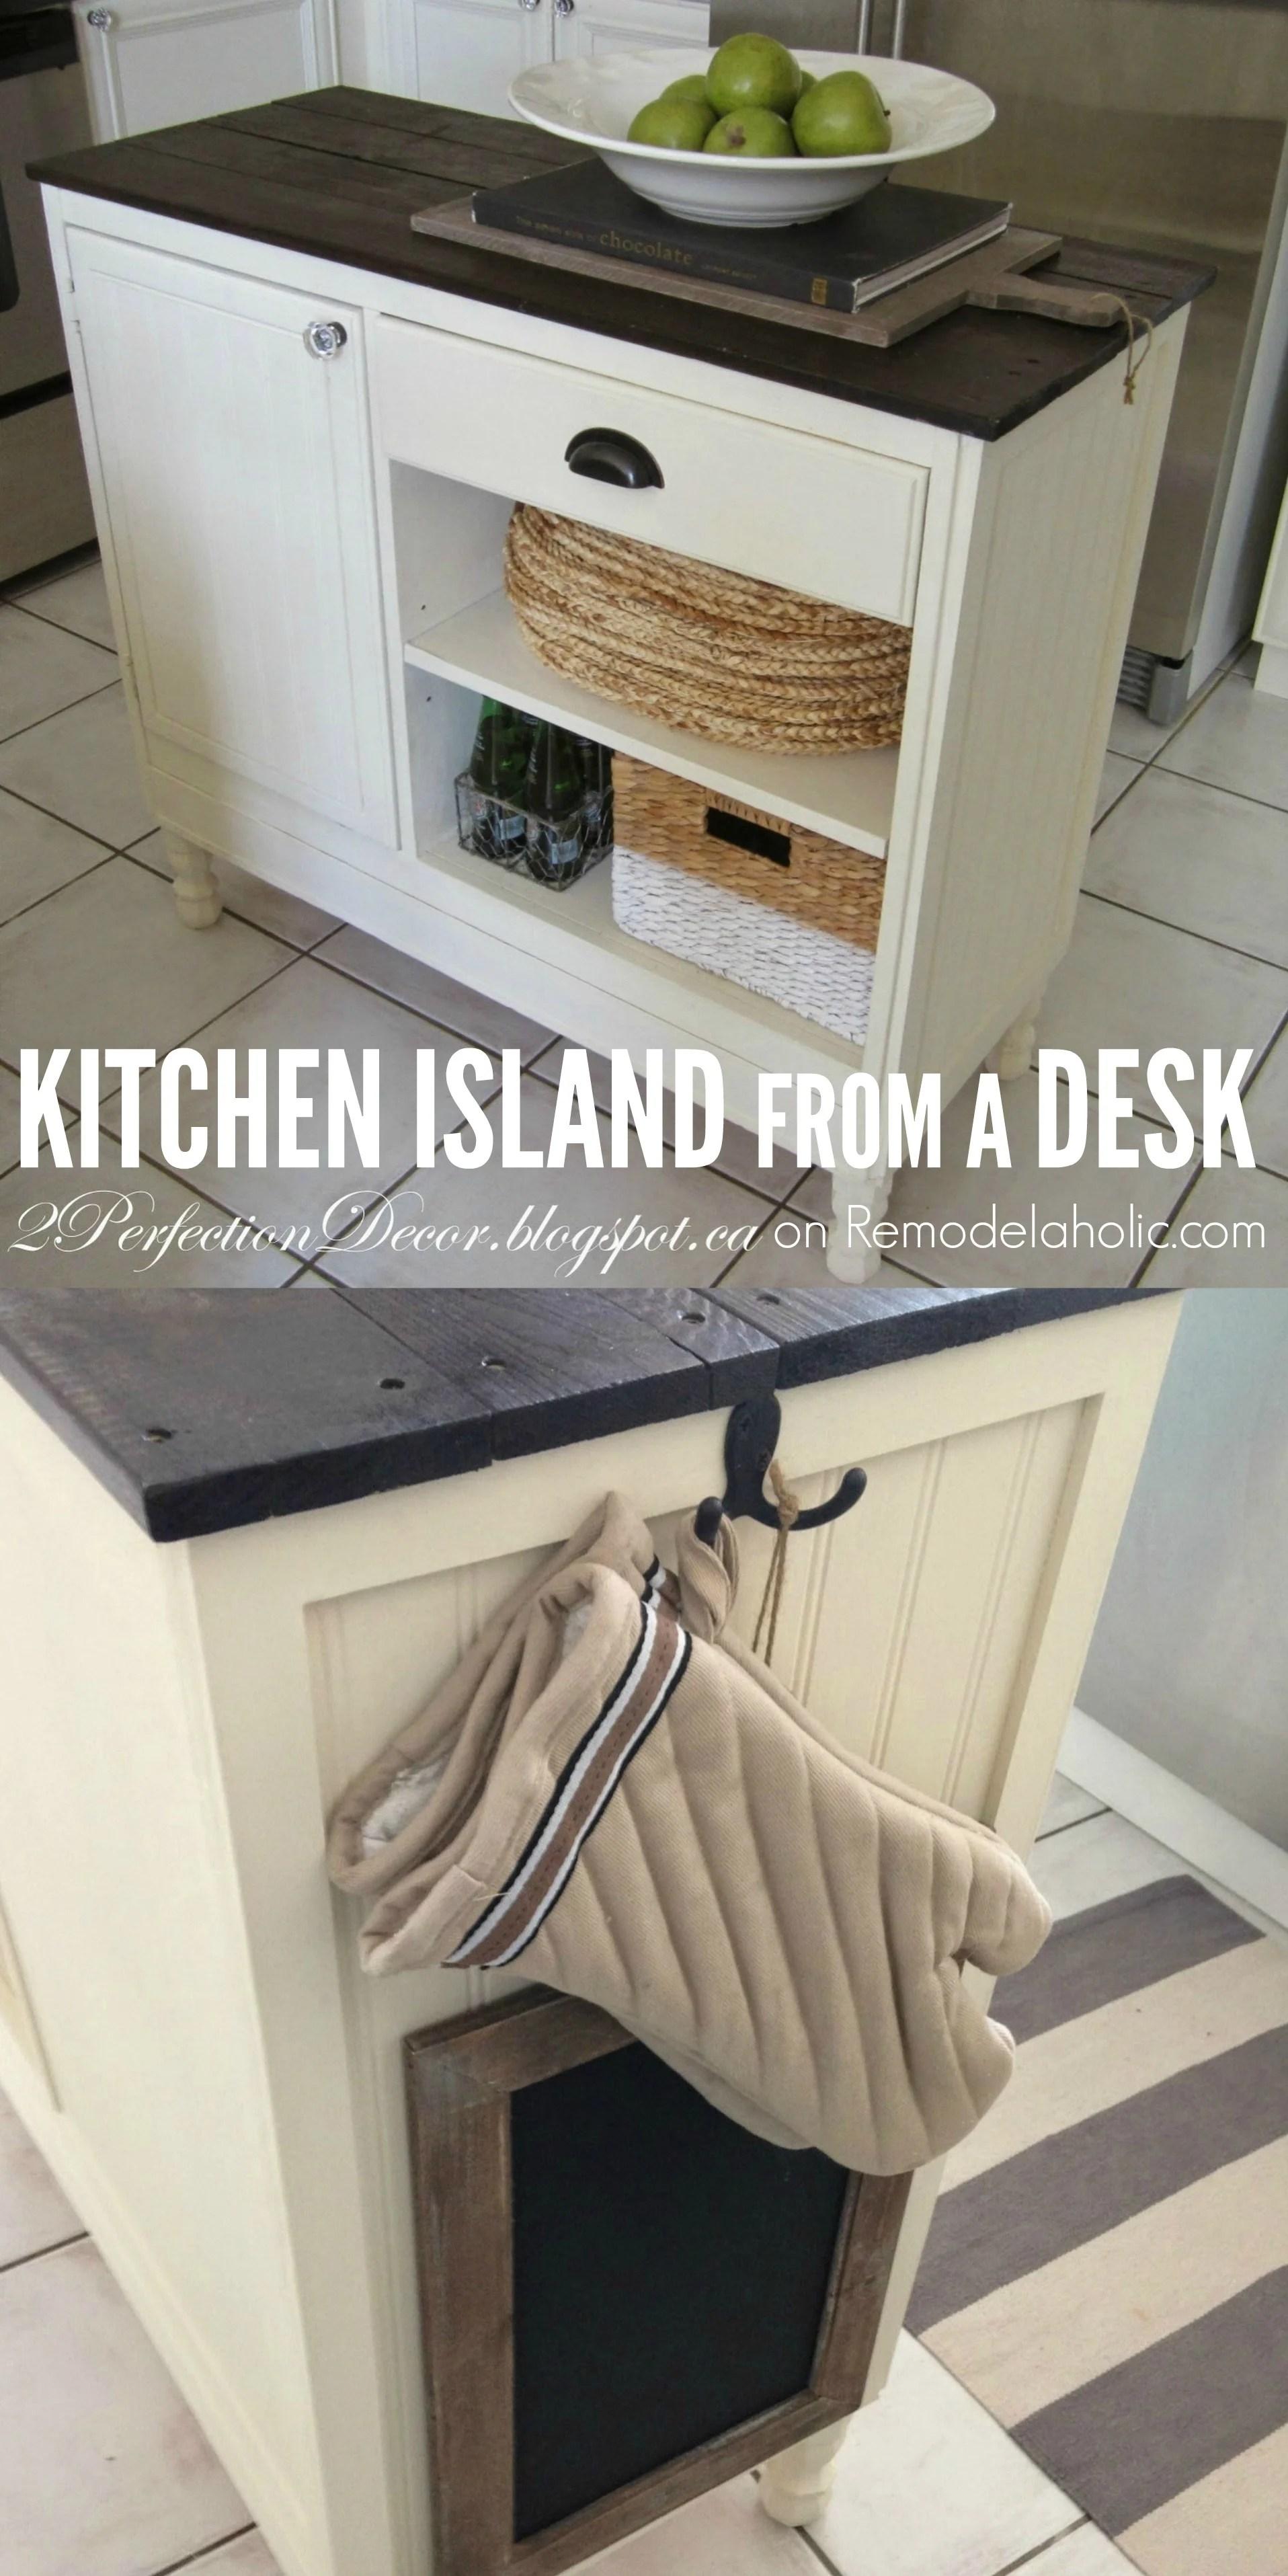 Remodelaholic Upcycled Vintage Desk Into Kitchen Island With Storage